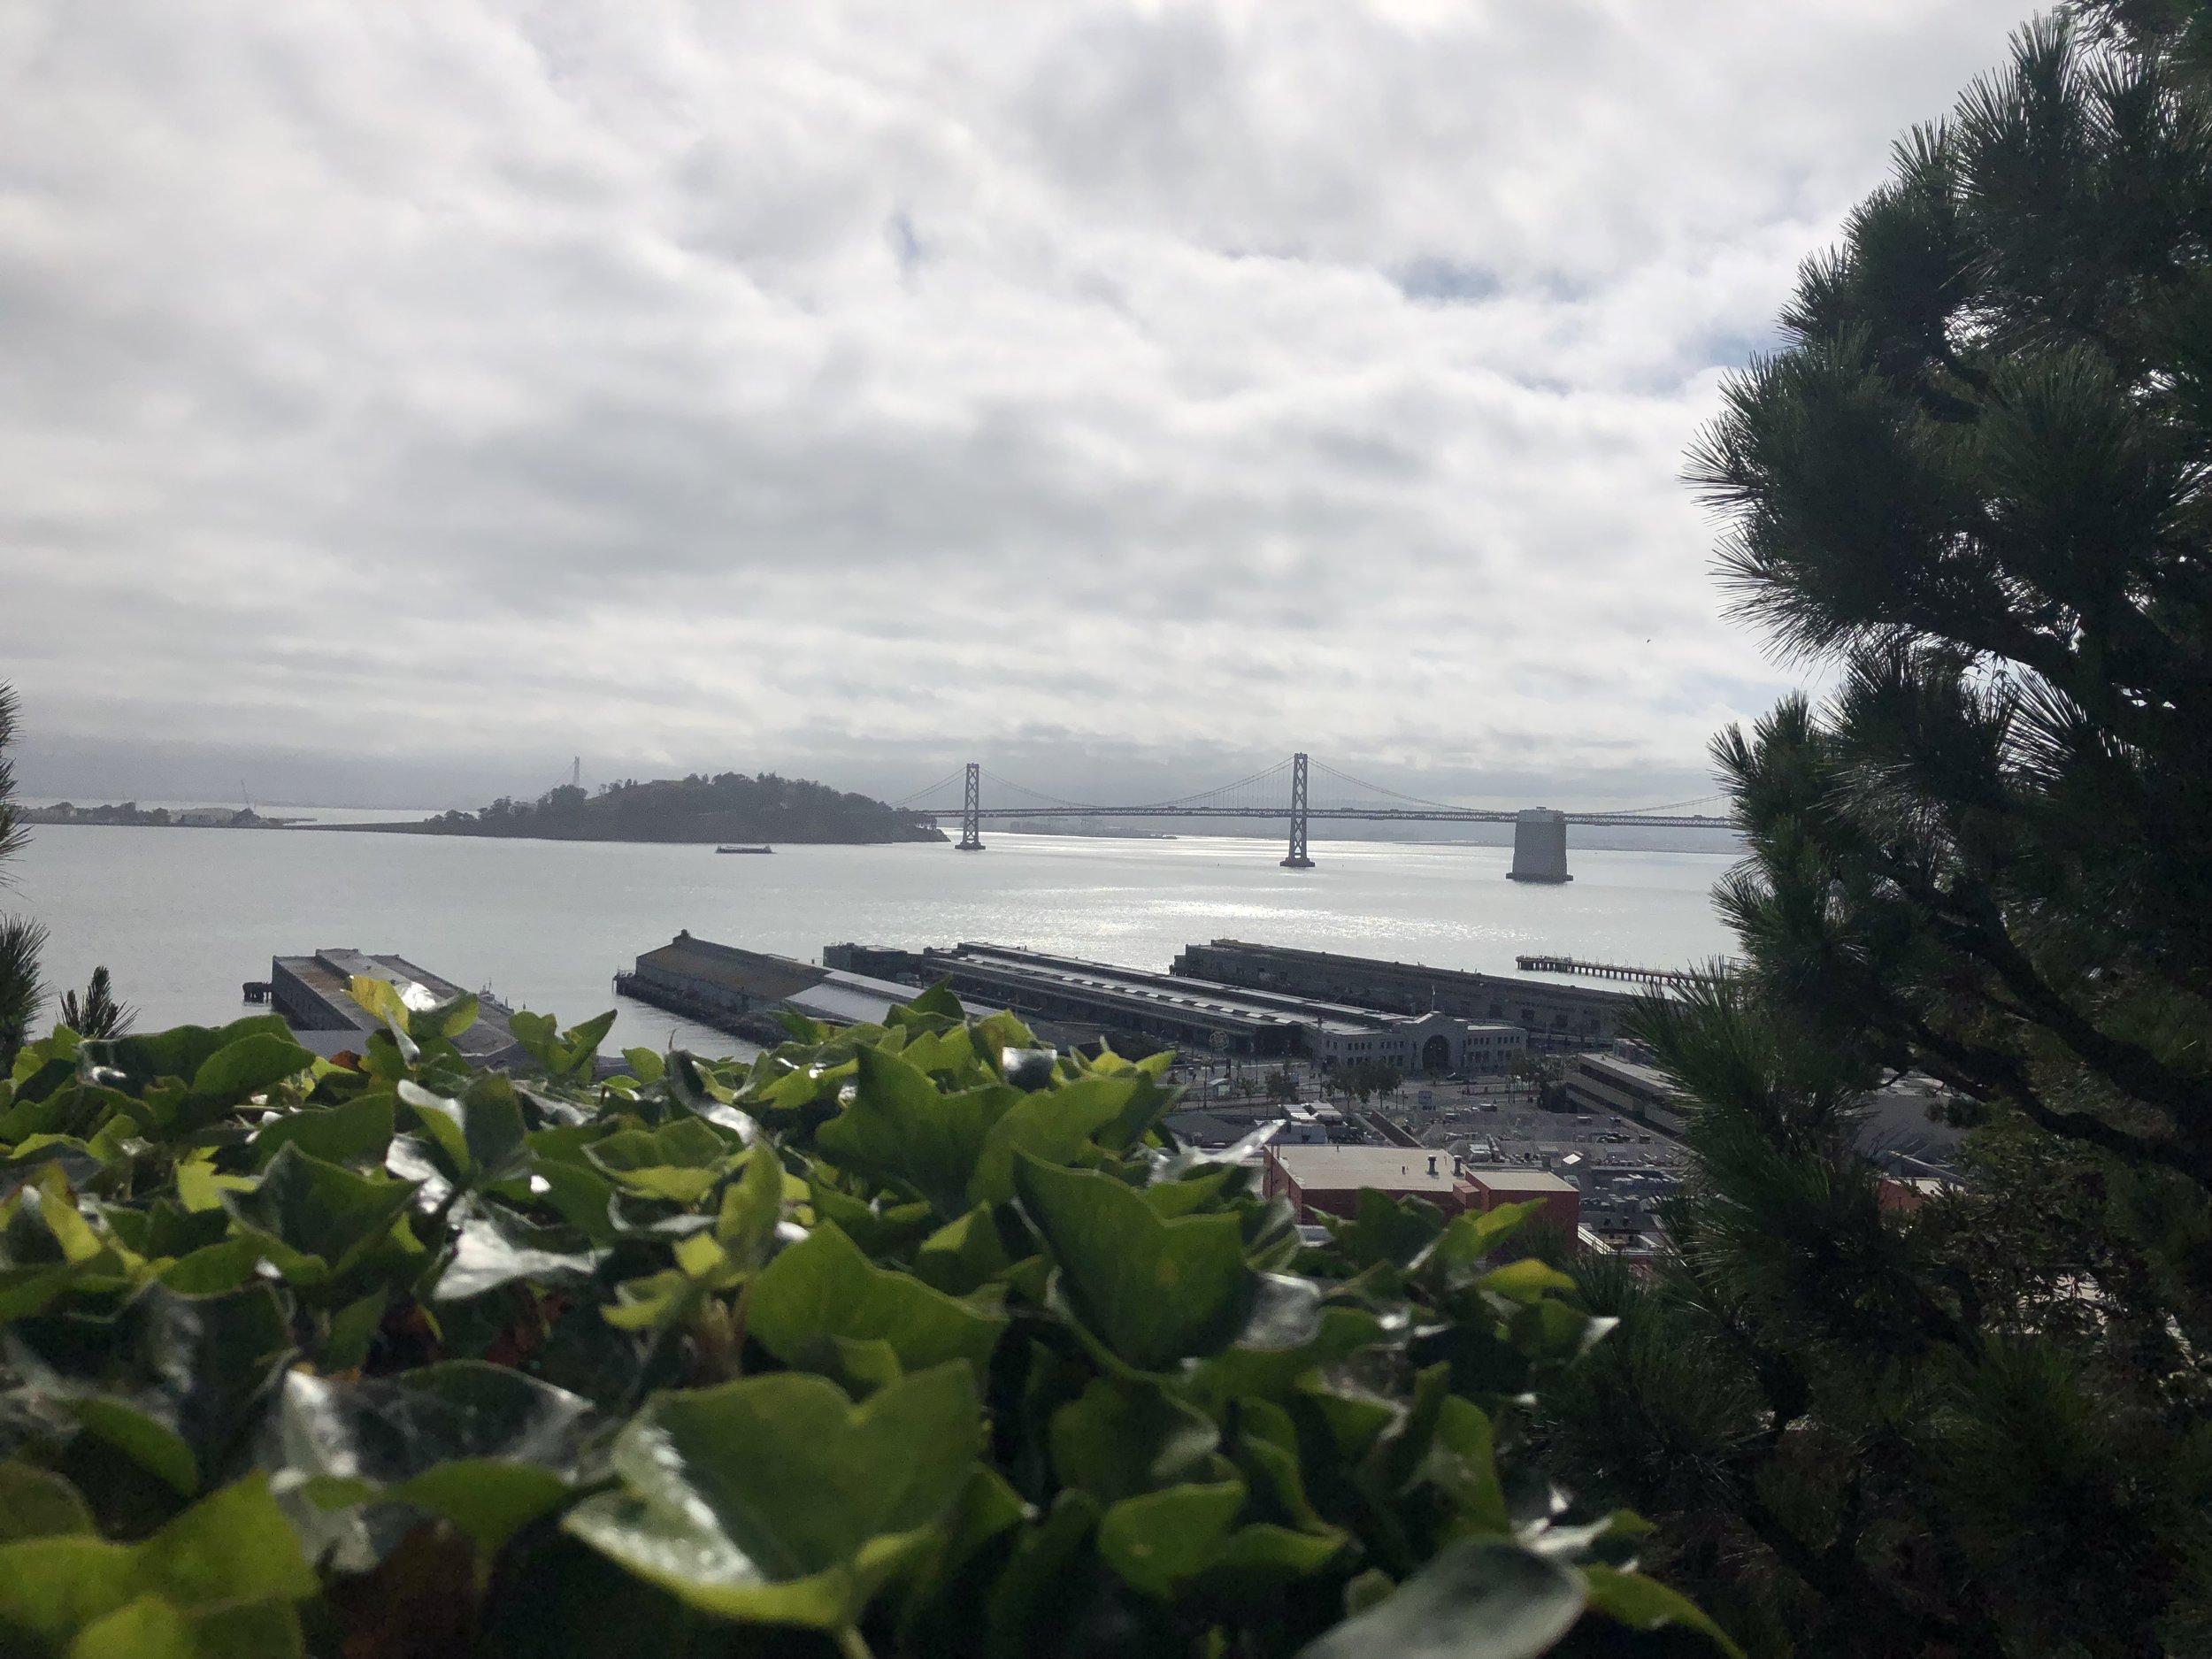 The San Francisco-Oakland Bay Bridge from Telegraph Hill.